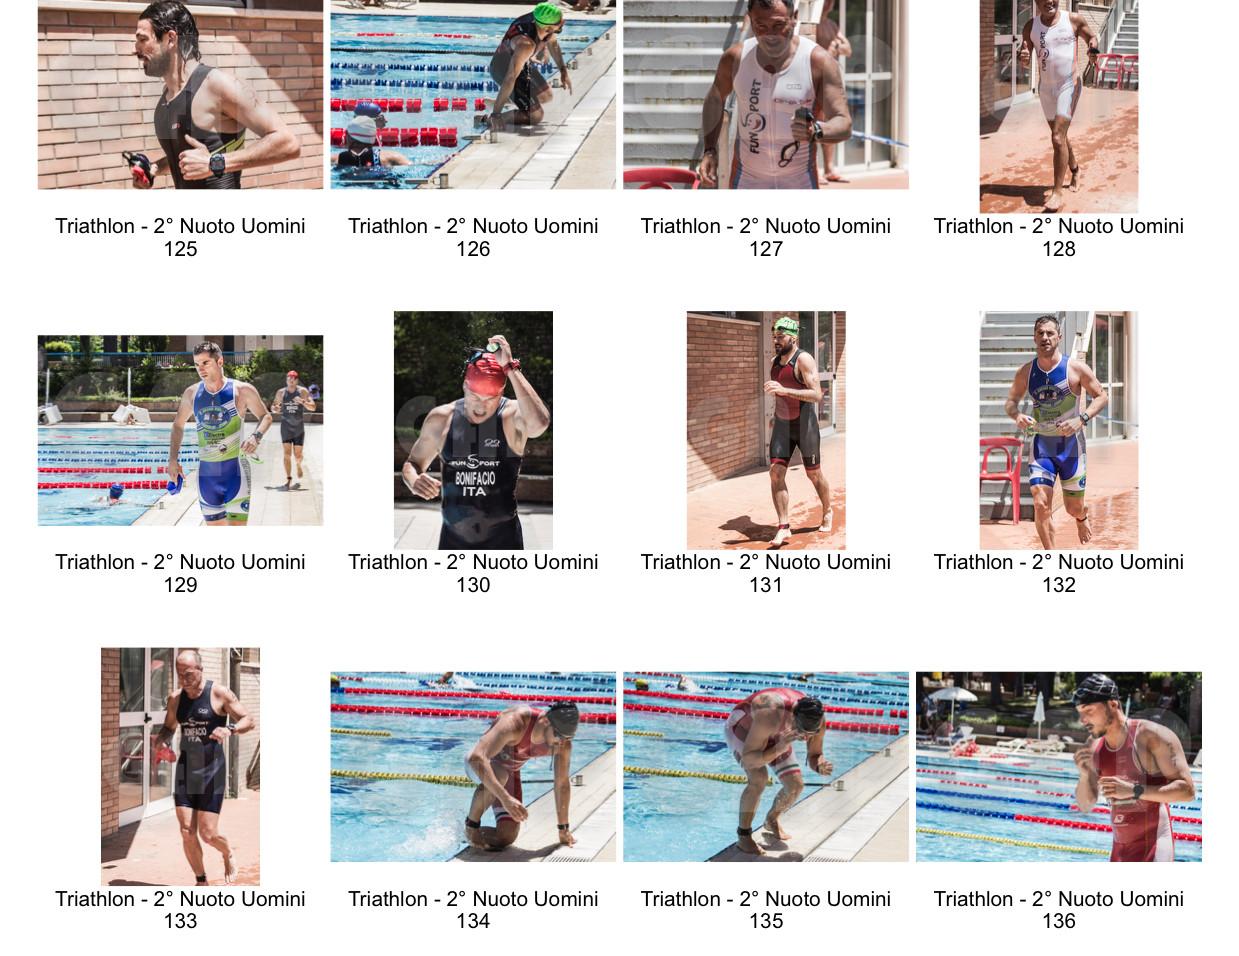 Triathlon_V.Elsa_-_2°_Frazione_Nuoto_Uomini_-7.jpg